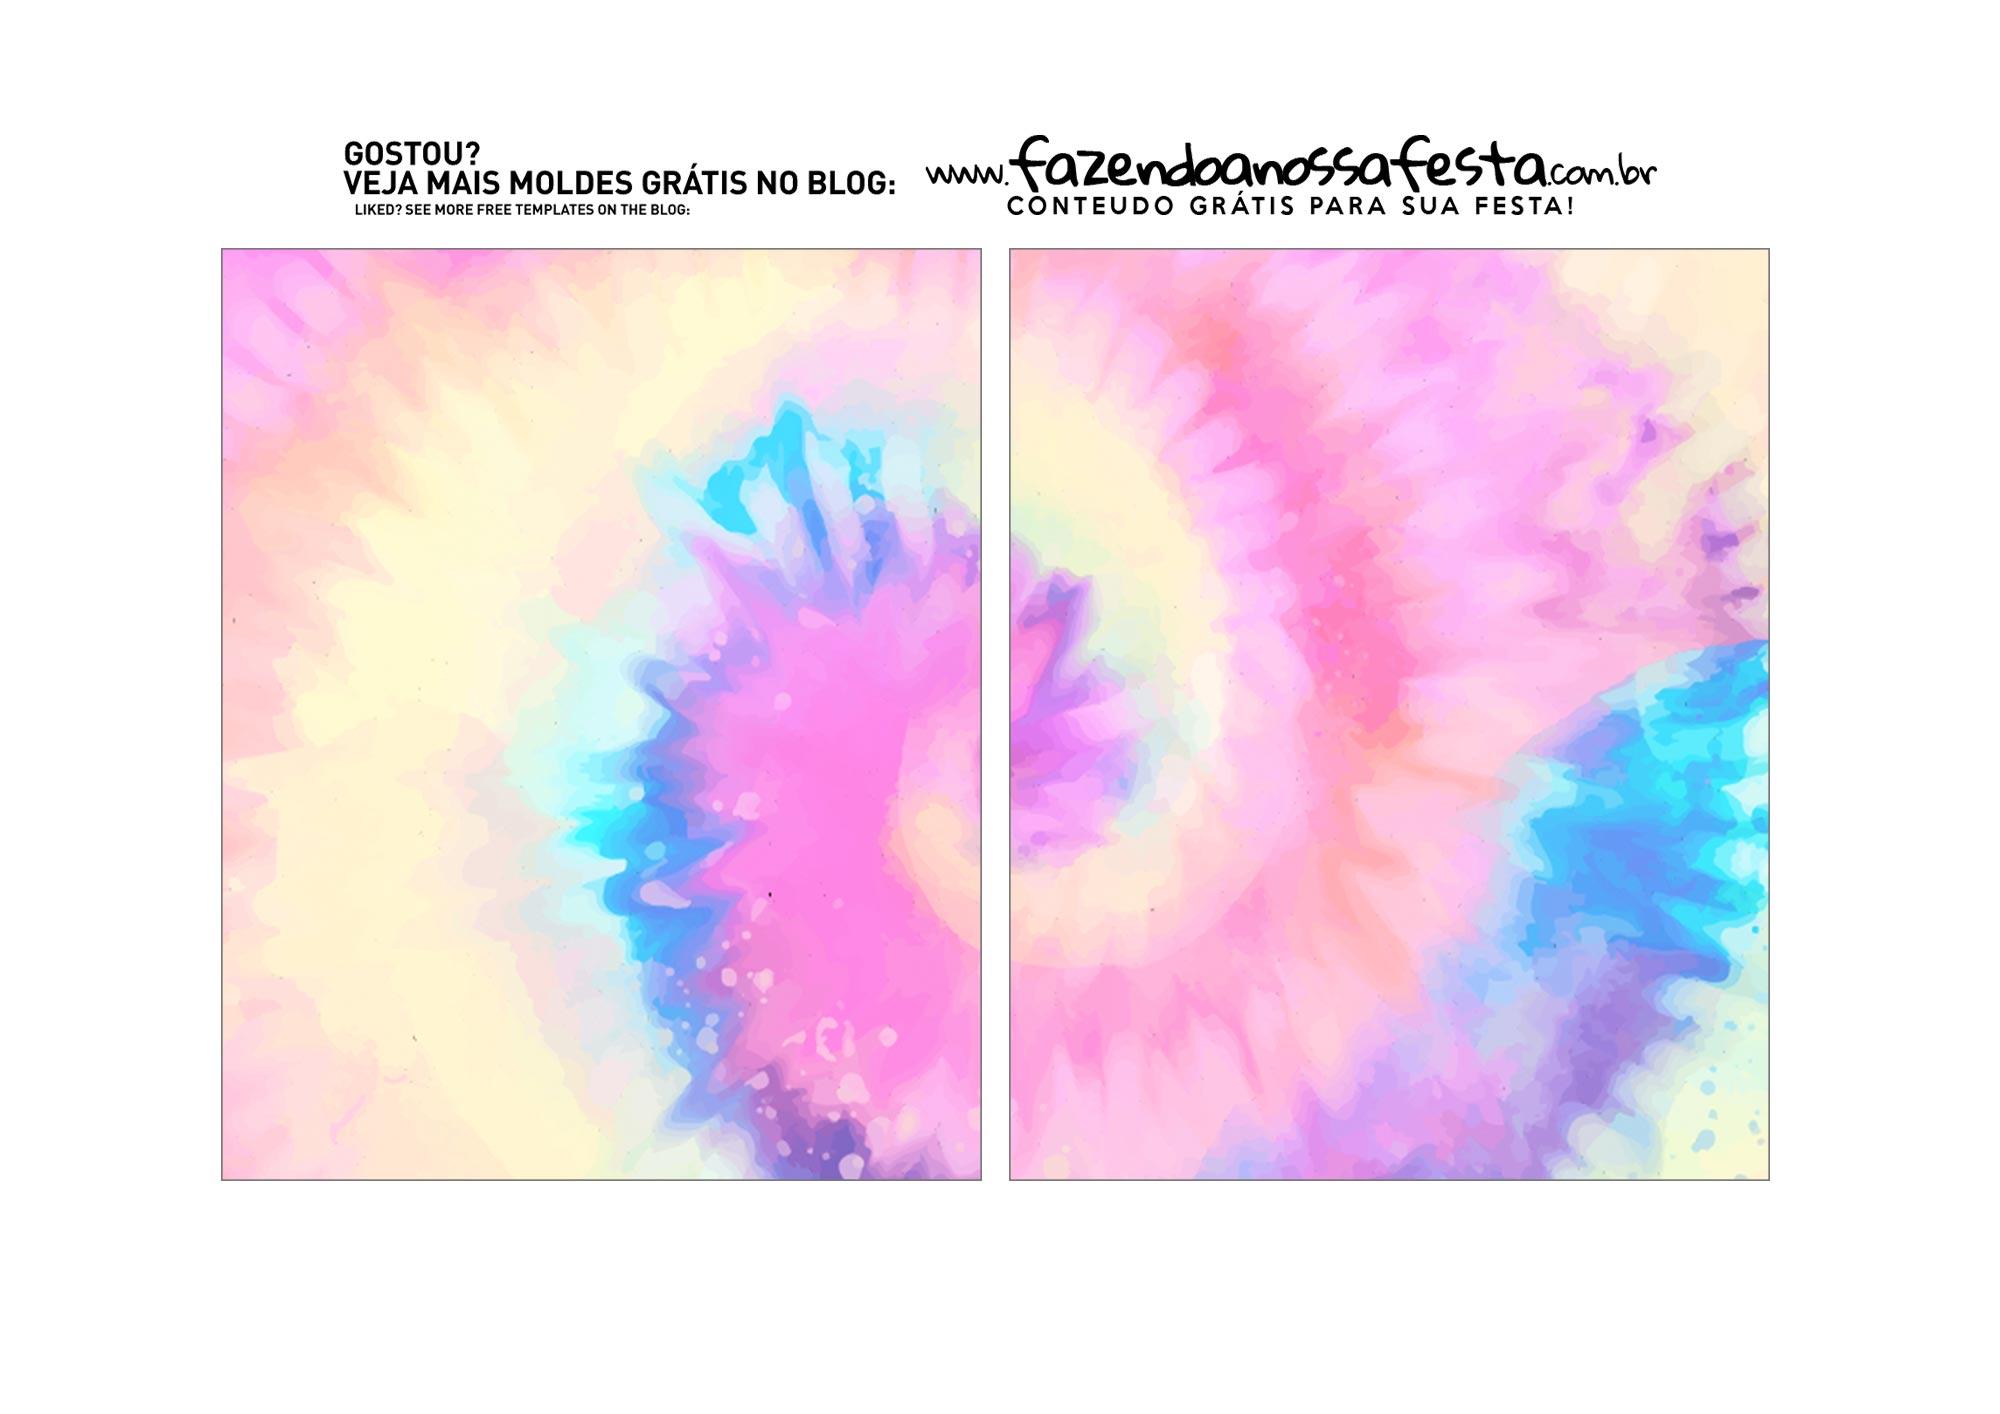 Caixa Explosao Mini Confeiteiro Tie Dye parte 3